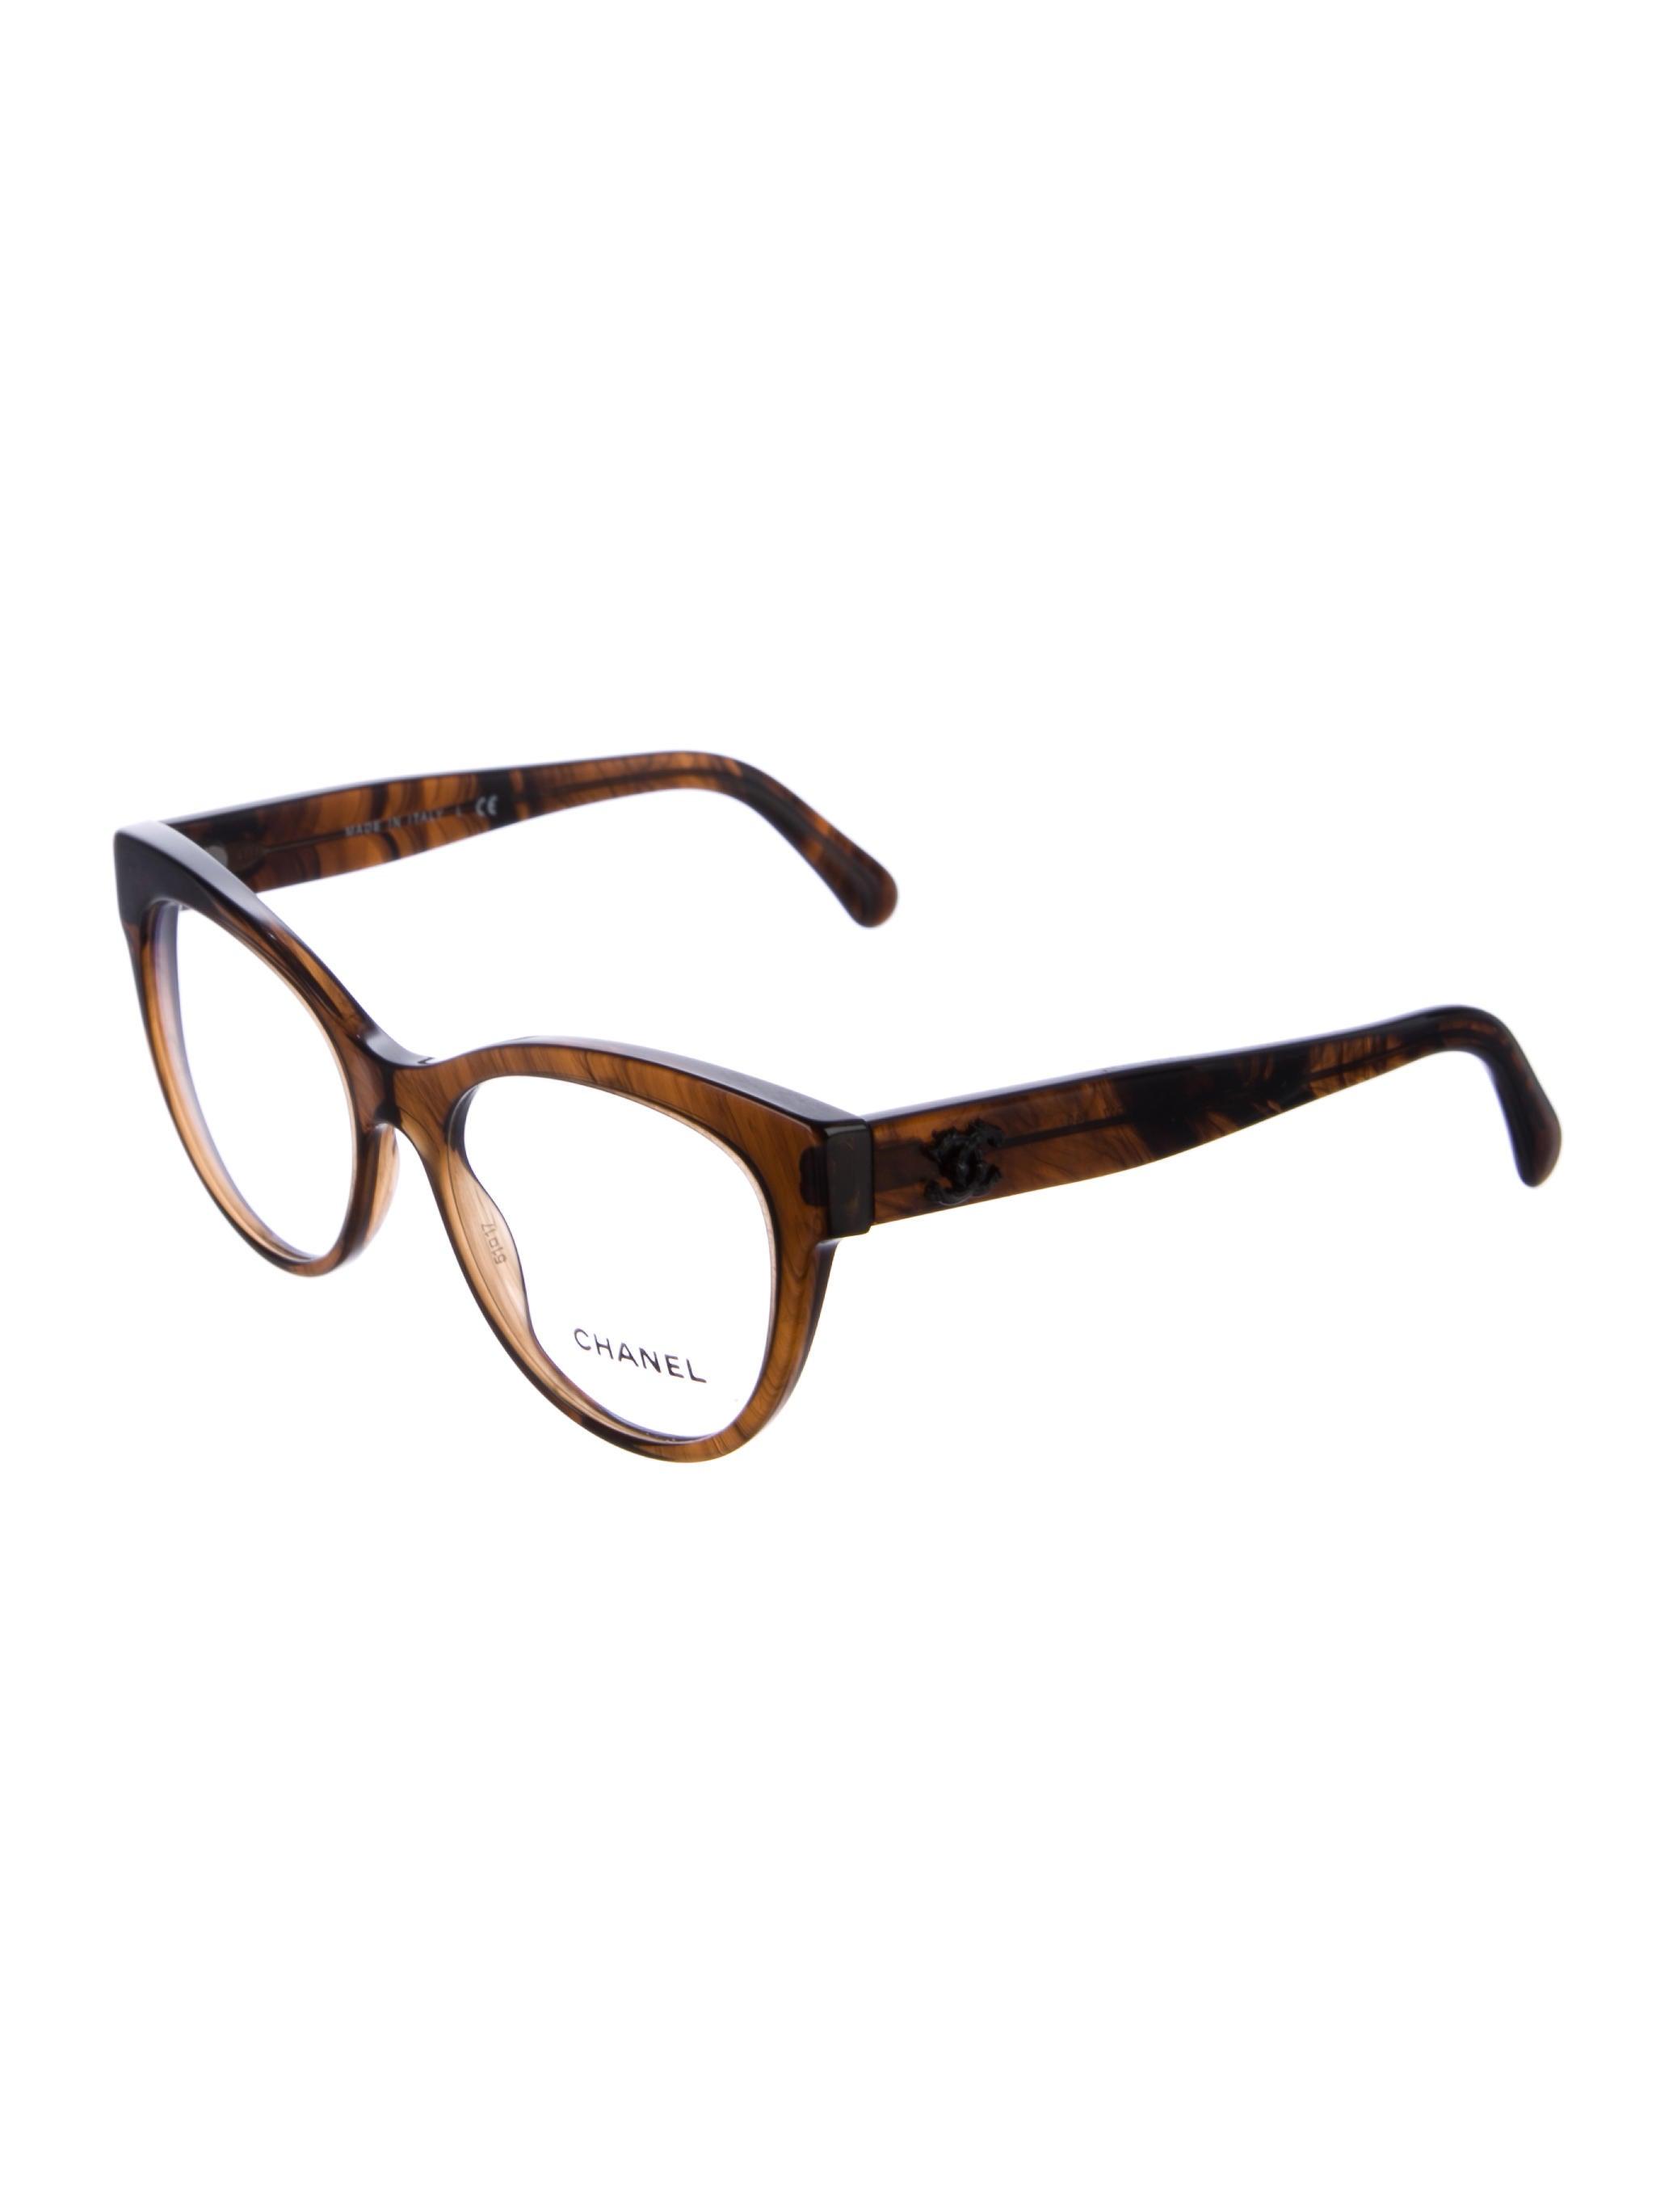 chanel cat eye eye glasses accessories cha203465 the